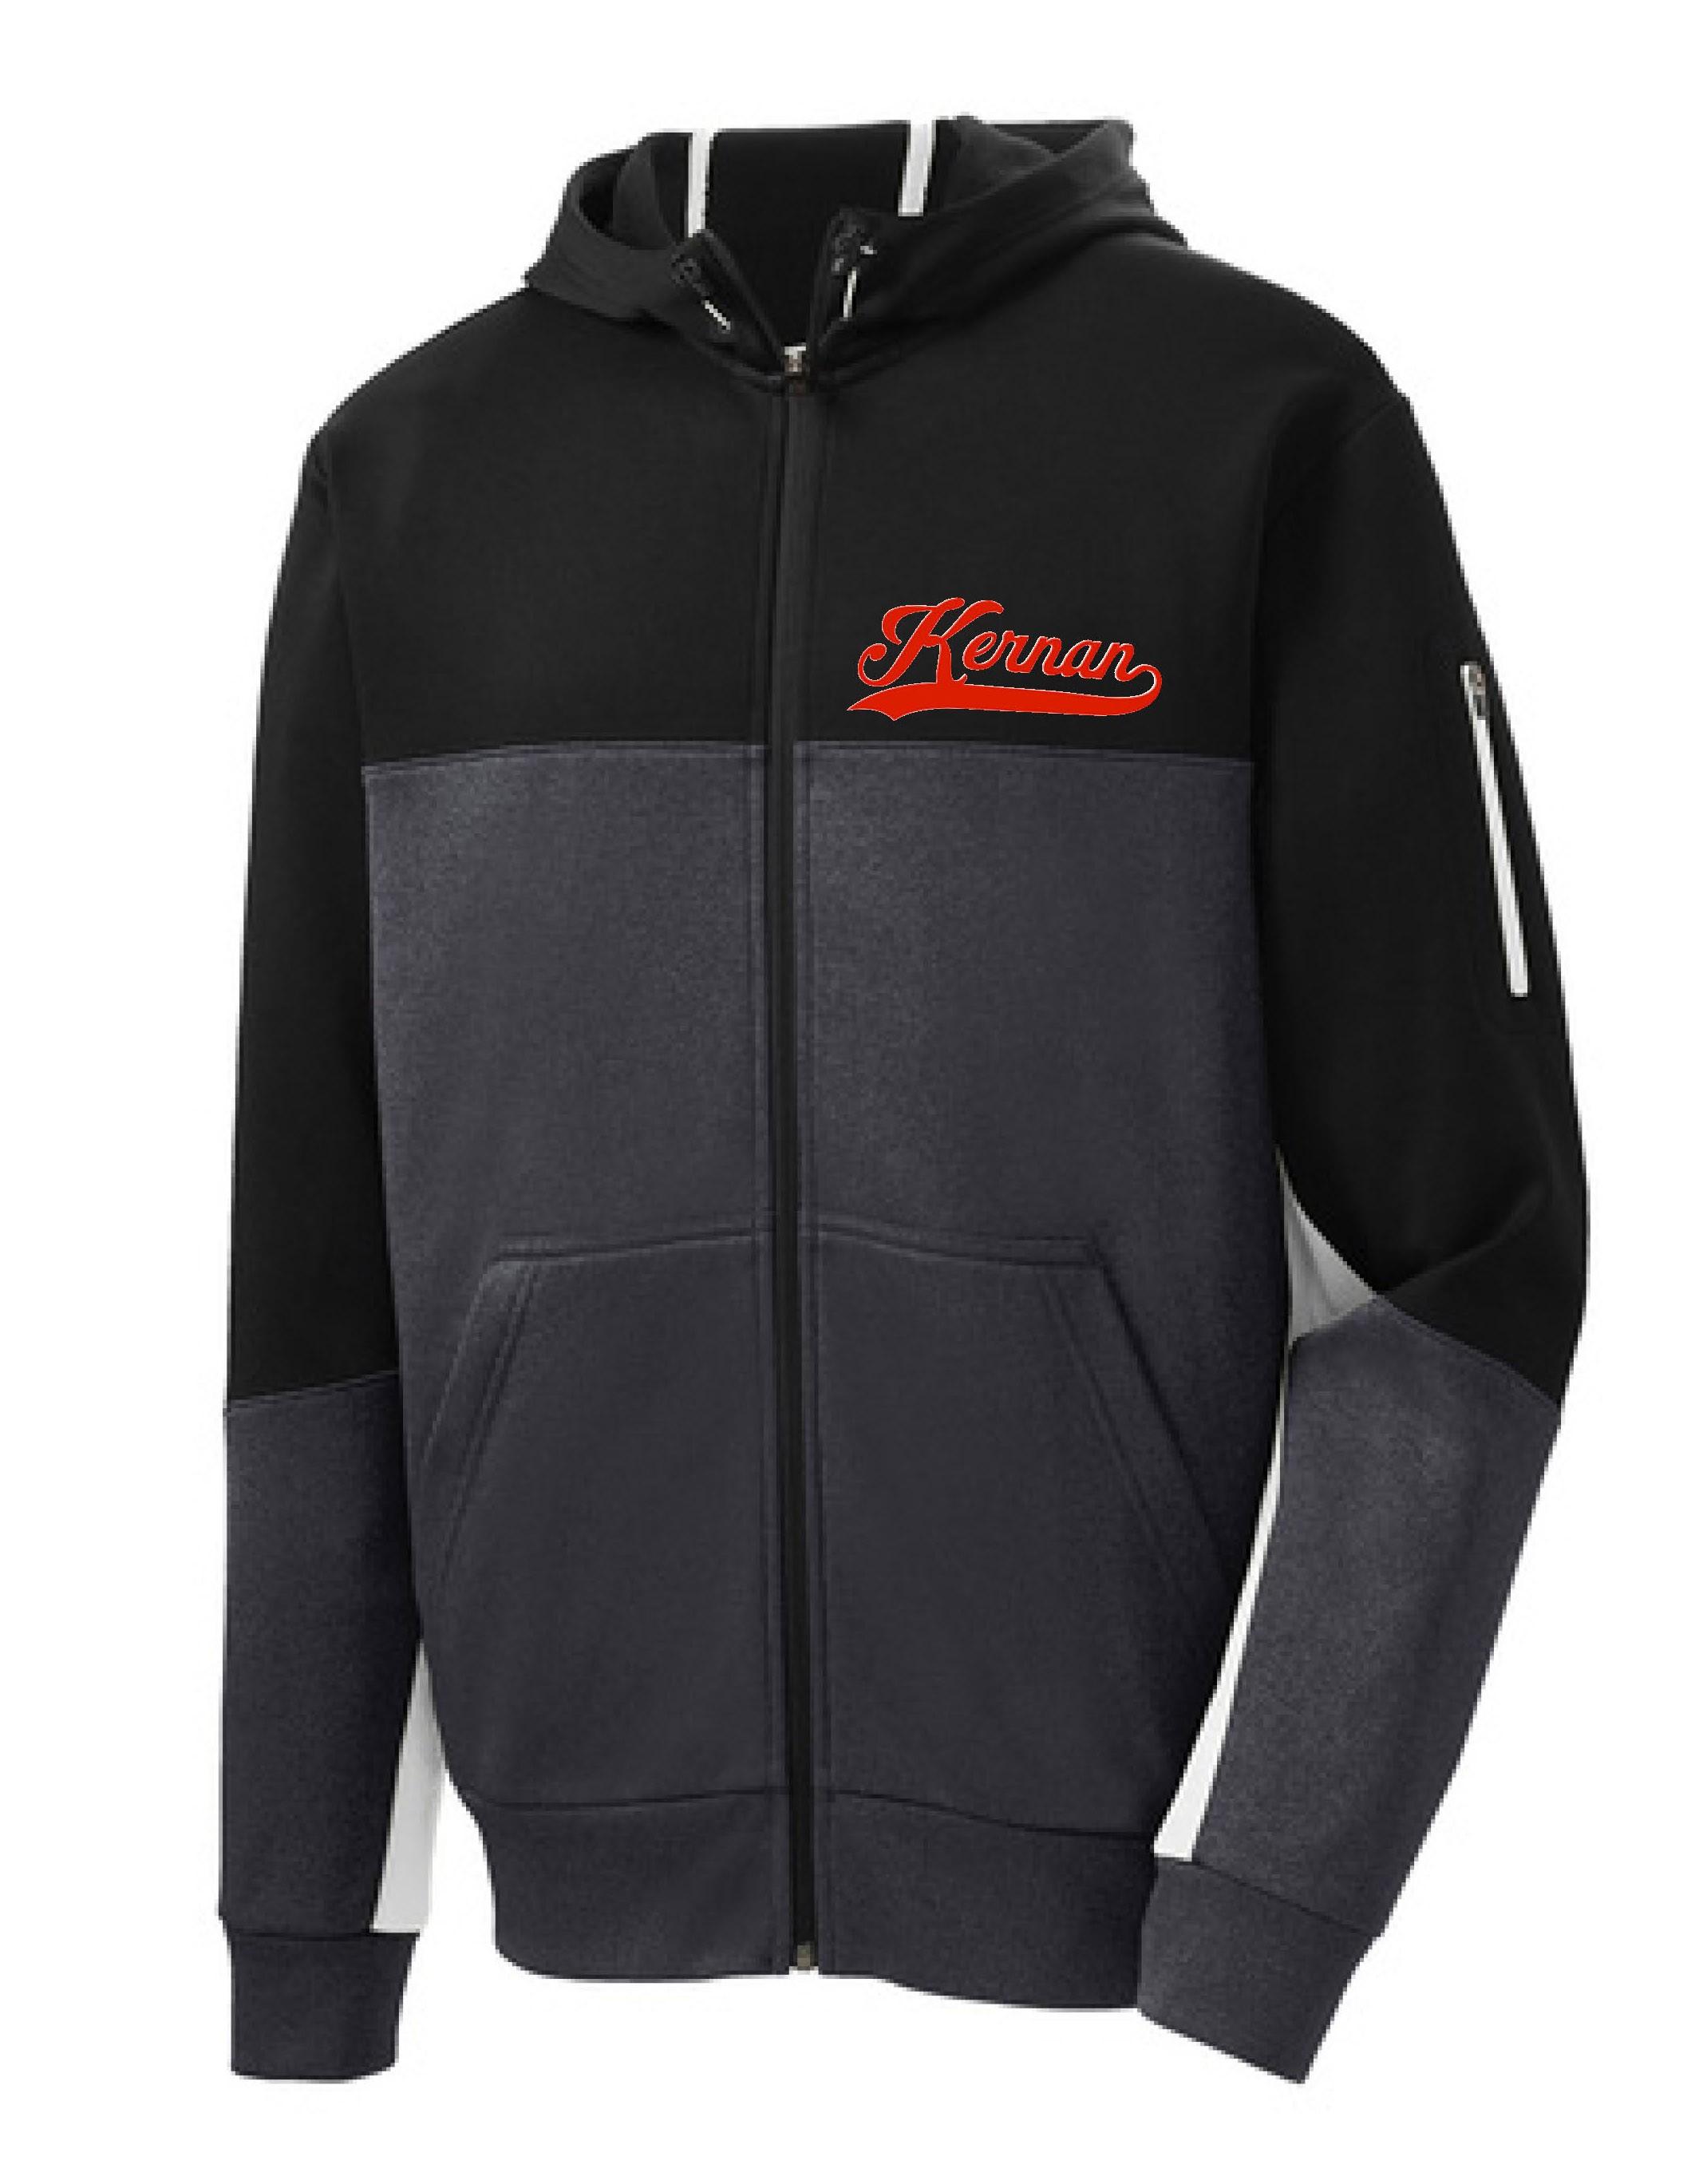 Kernan Mens Sport-Tek Colorblock Full Zip Hooded Jacket